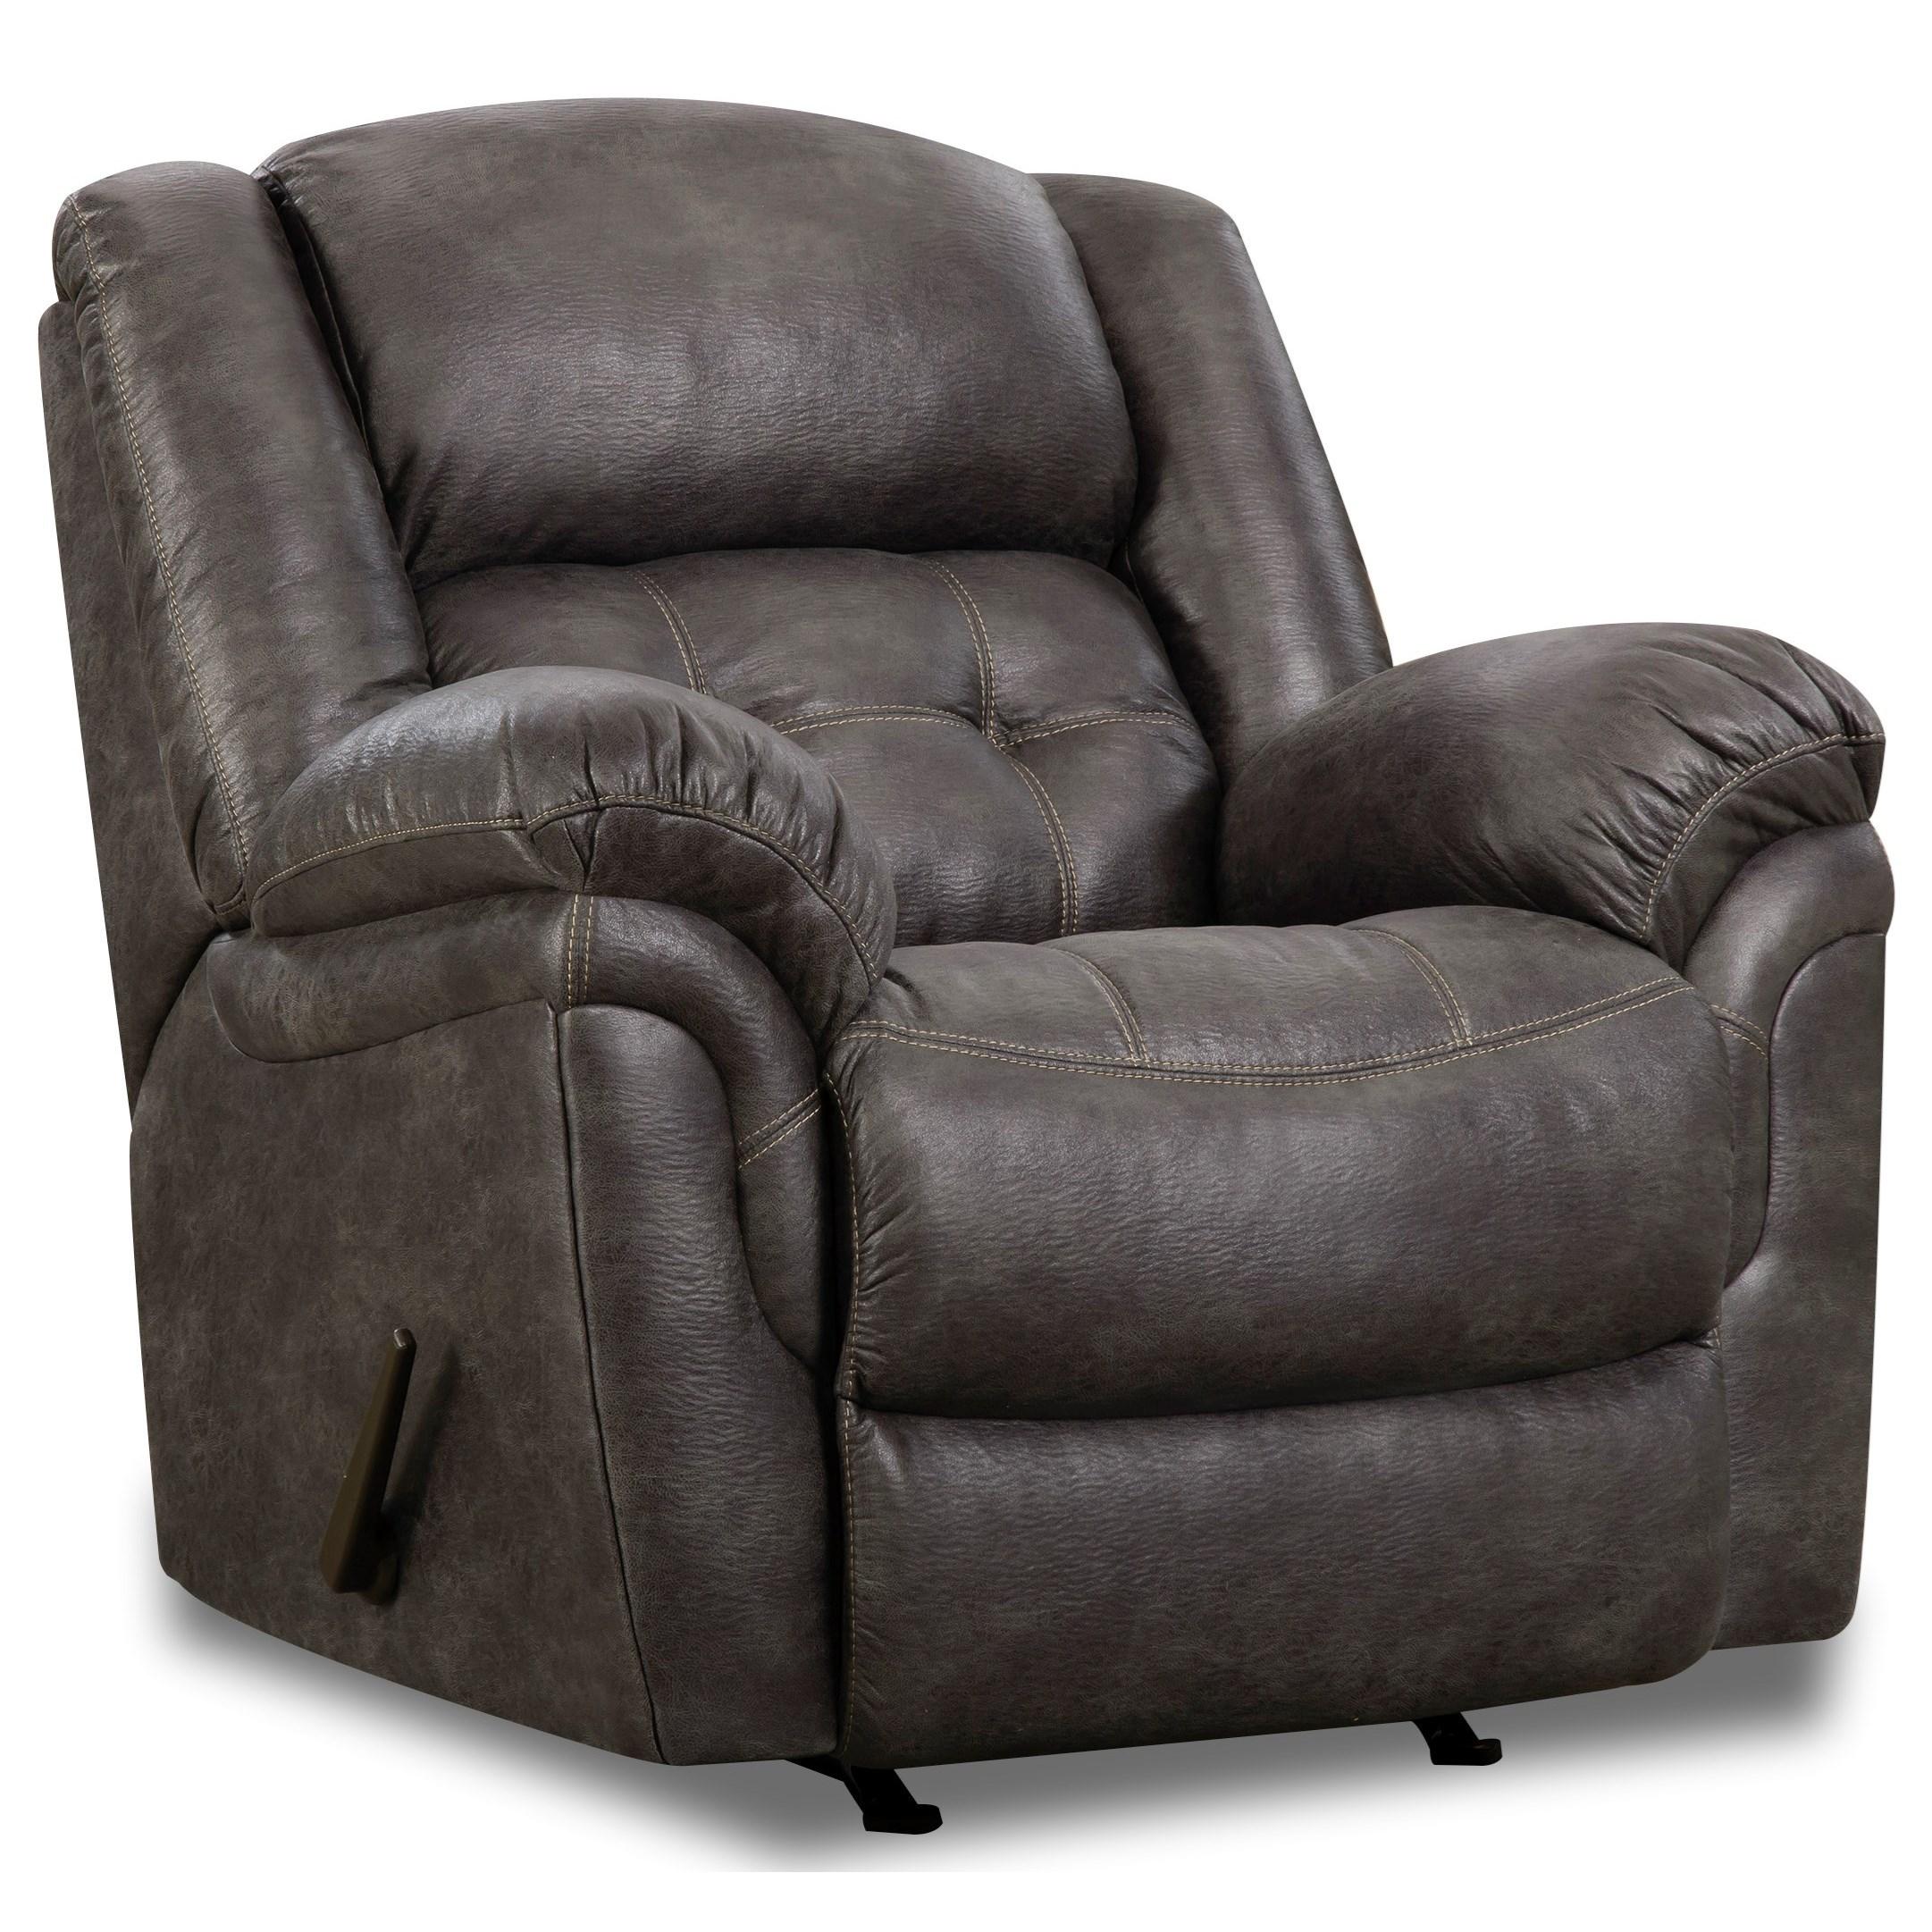 129 Rocker Recliner  by HomeStretch at Bullard Furniture